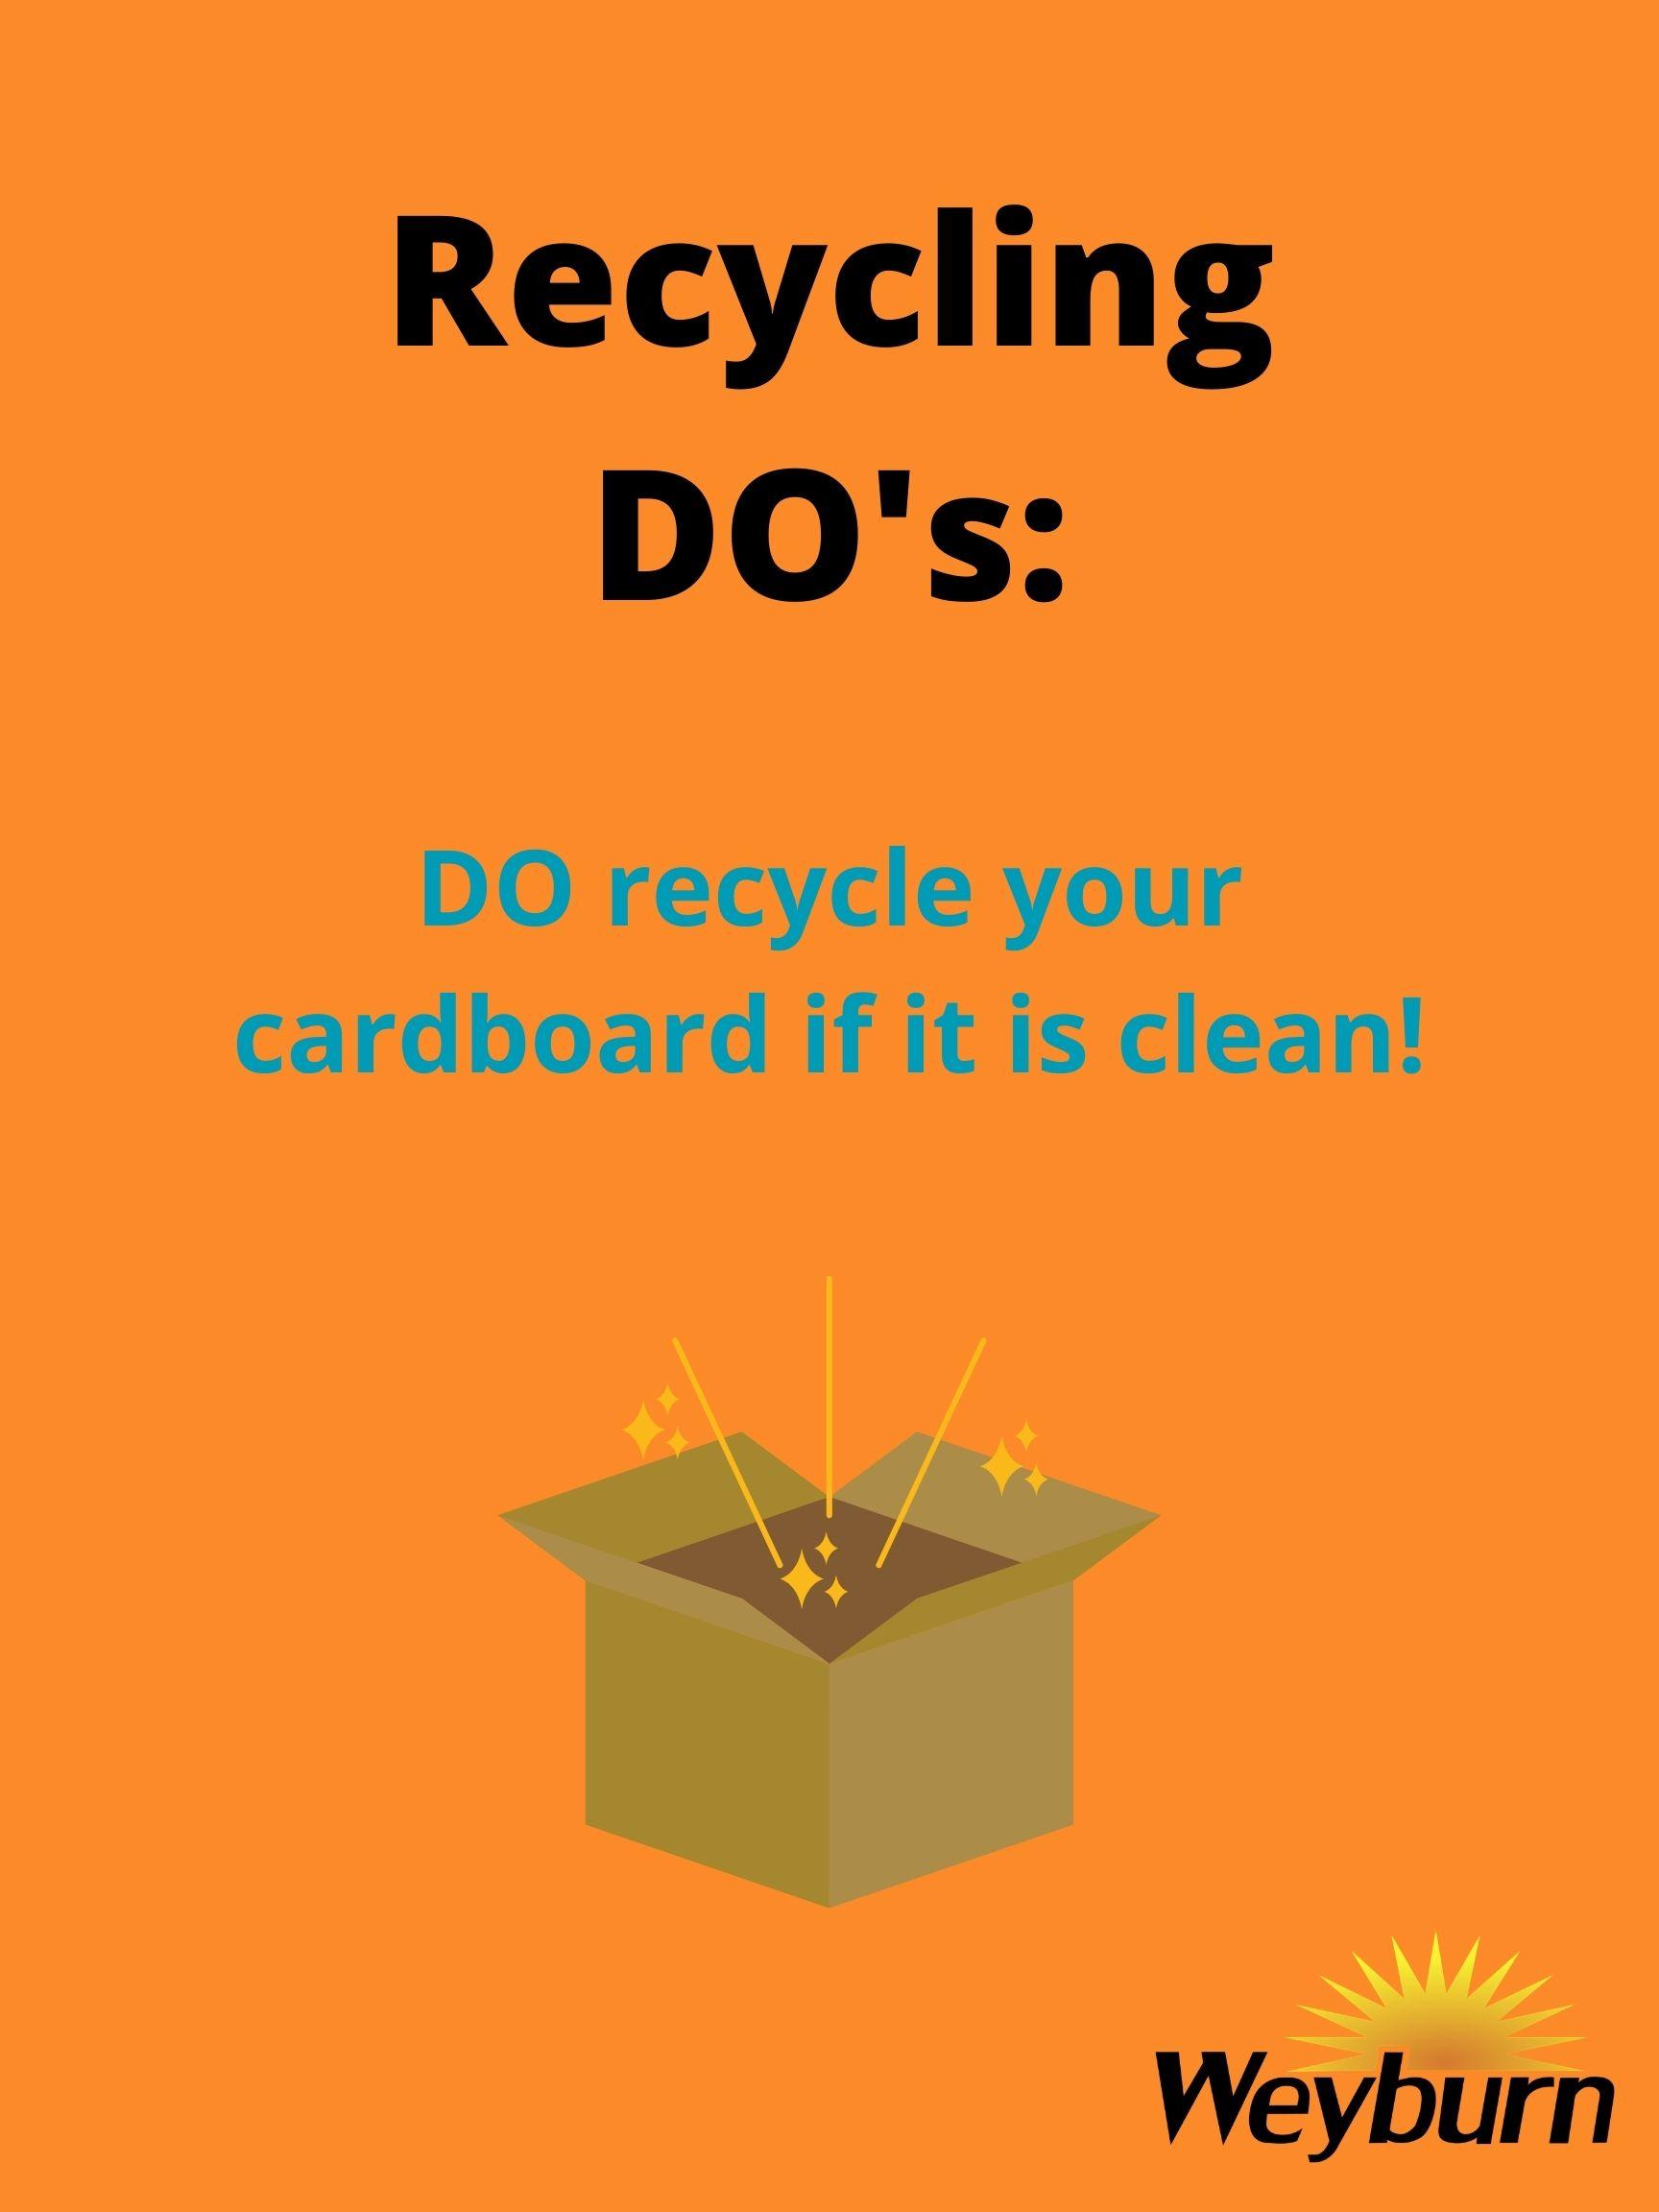 Recycling-DOs_Cardboard